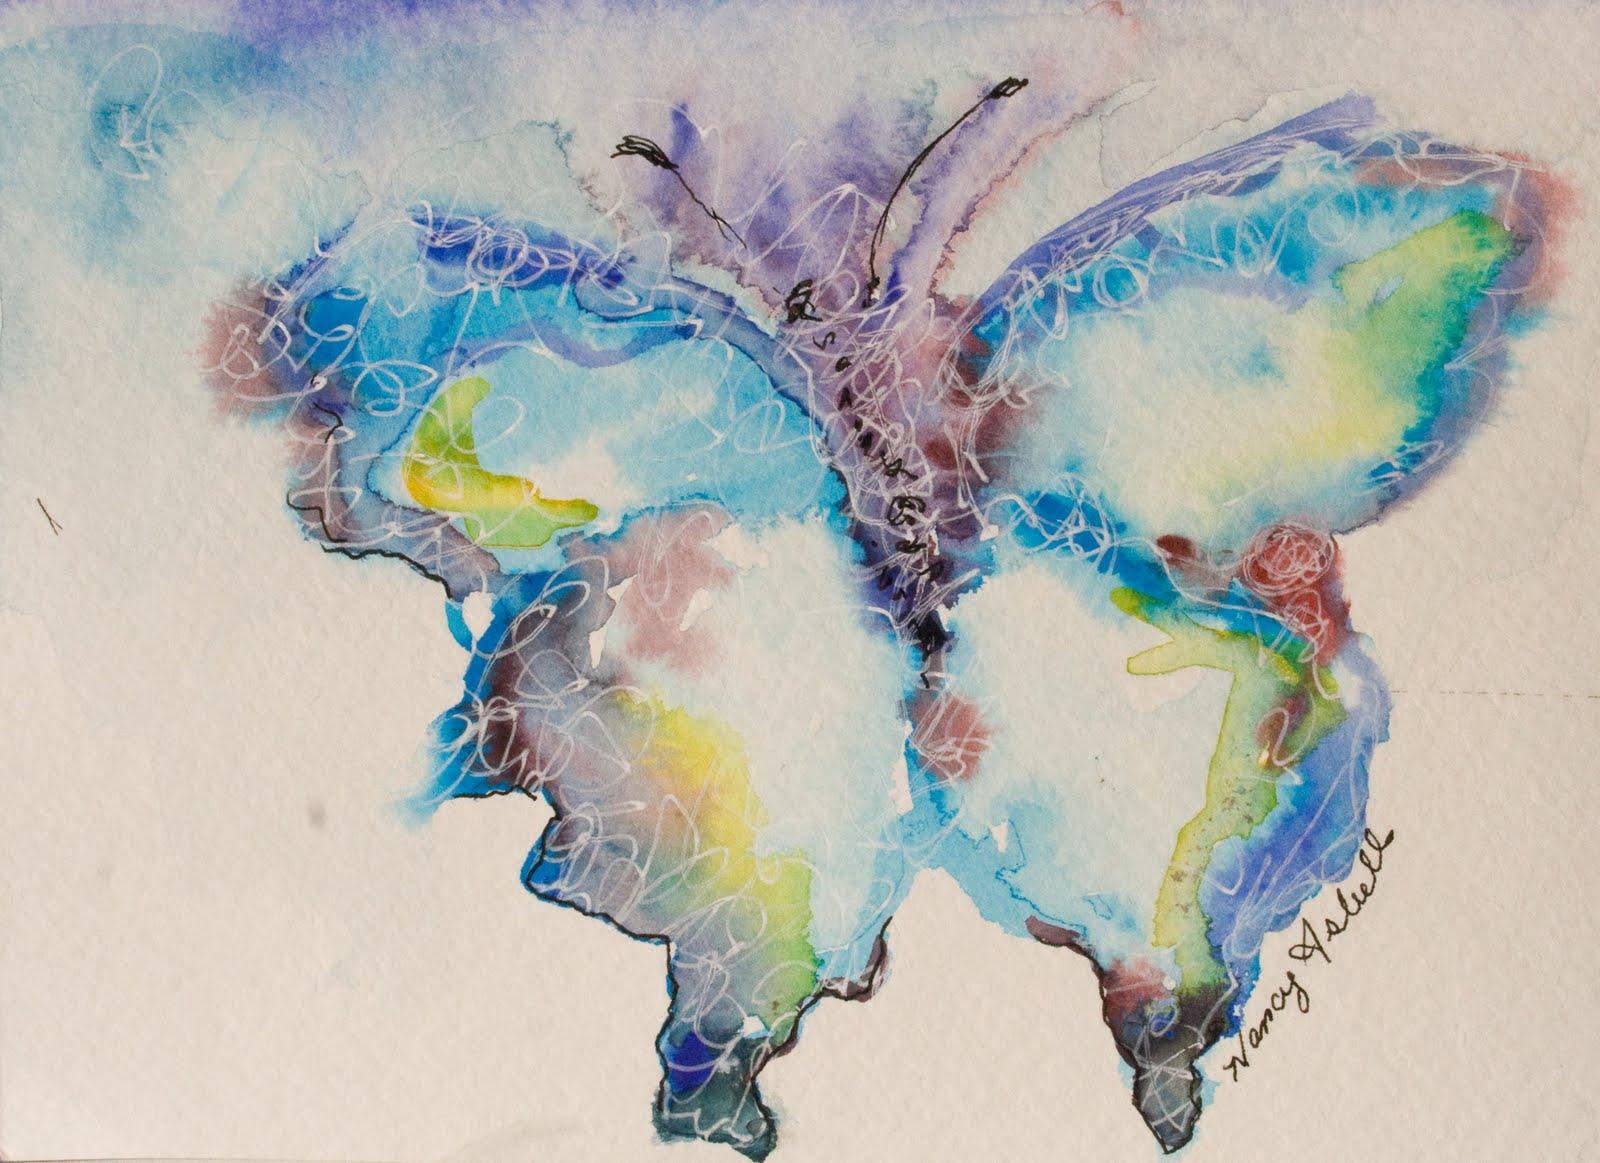 http://2.bp.blogspot.com/-zkZIWNnoSBc/TVPvEpI6EyI/AAAAAAAAARo/ewkN2UtVsU4/s1600/water%2Bbutterfly.jpg